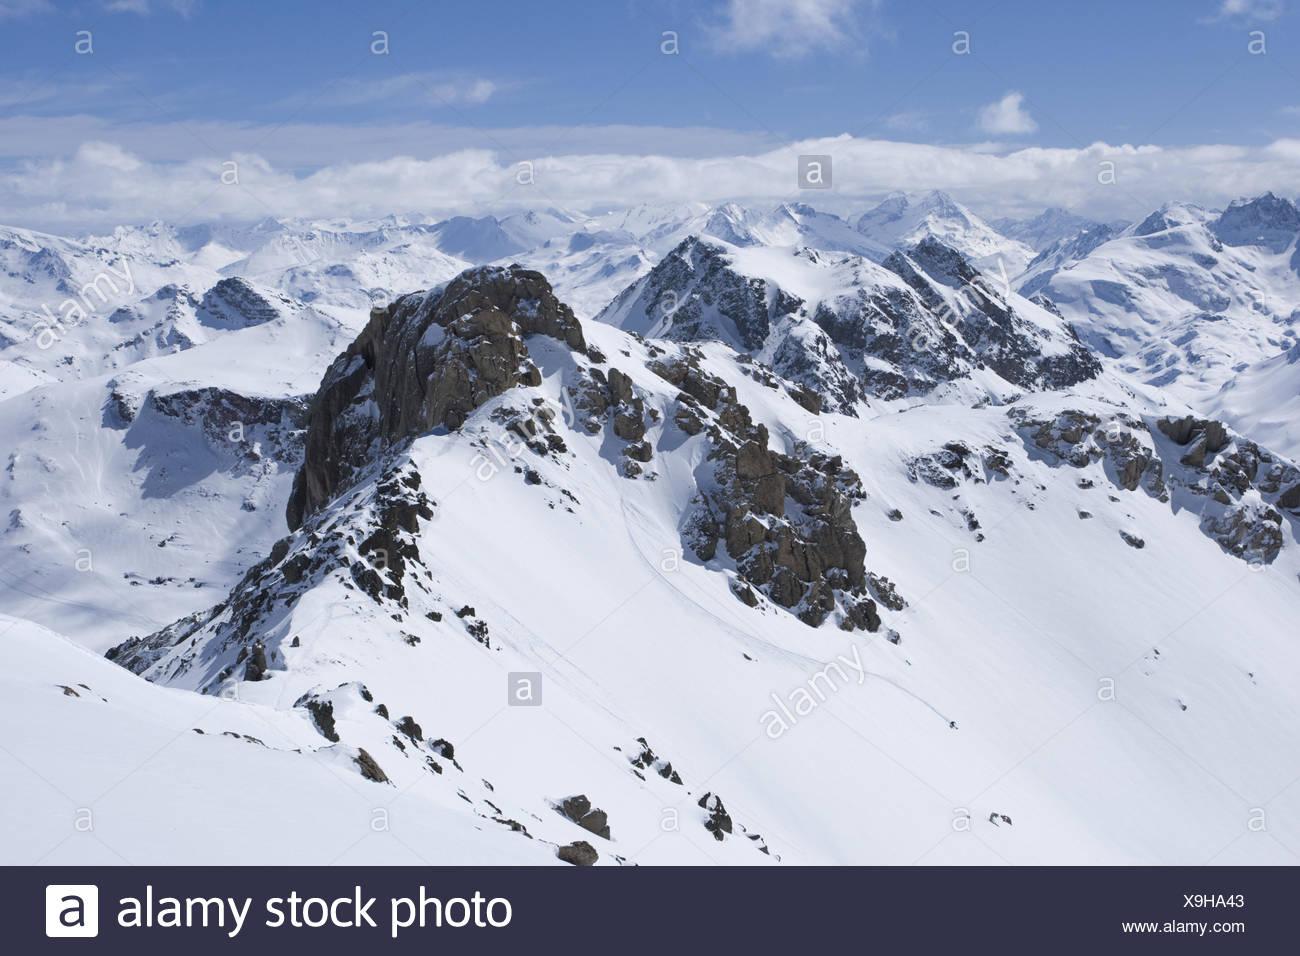 Switzerland, the Engadine, Piz Güglia, view, mountain landscape, winter, - Stock Image